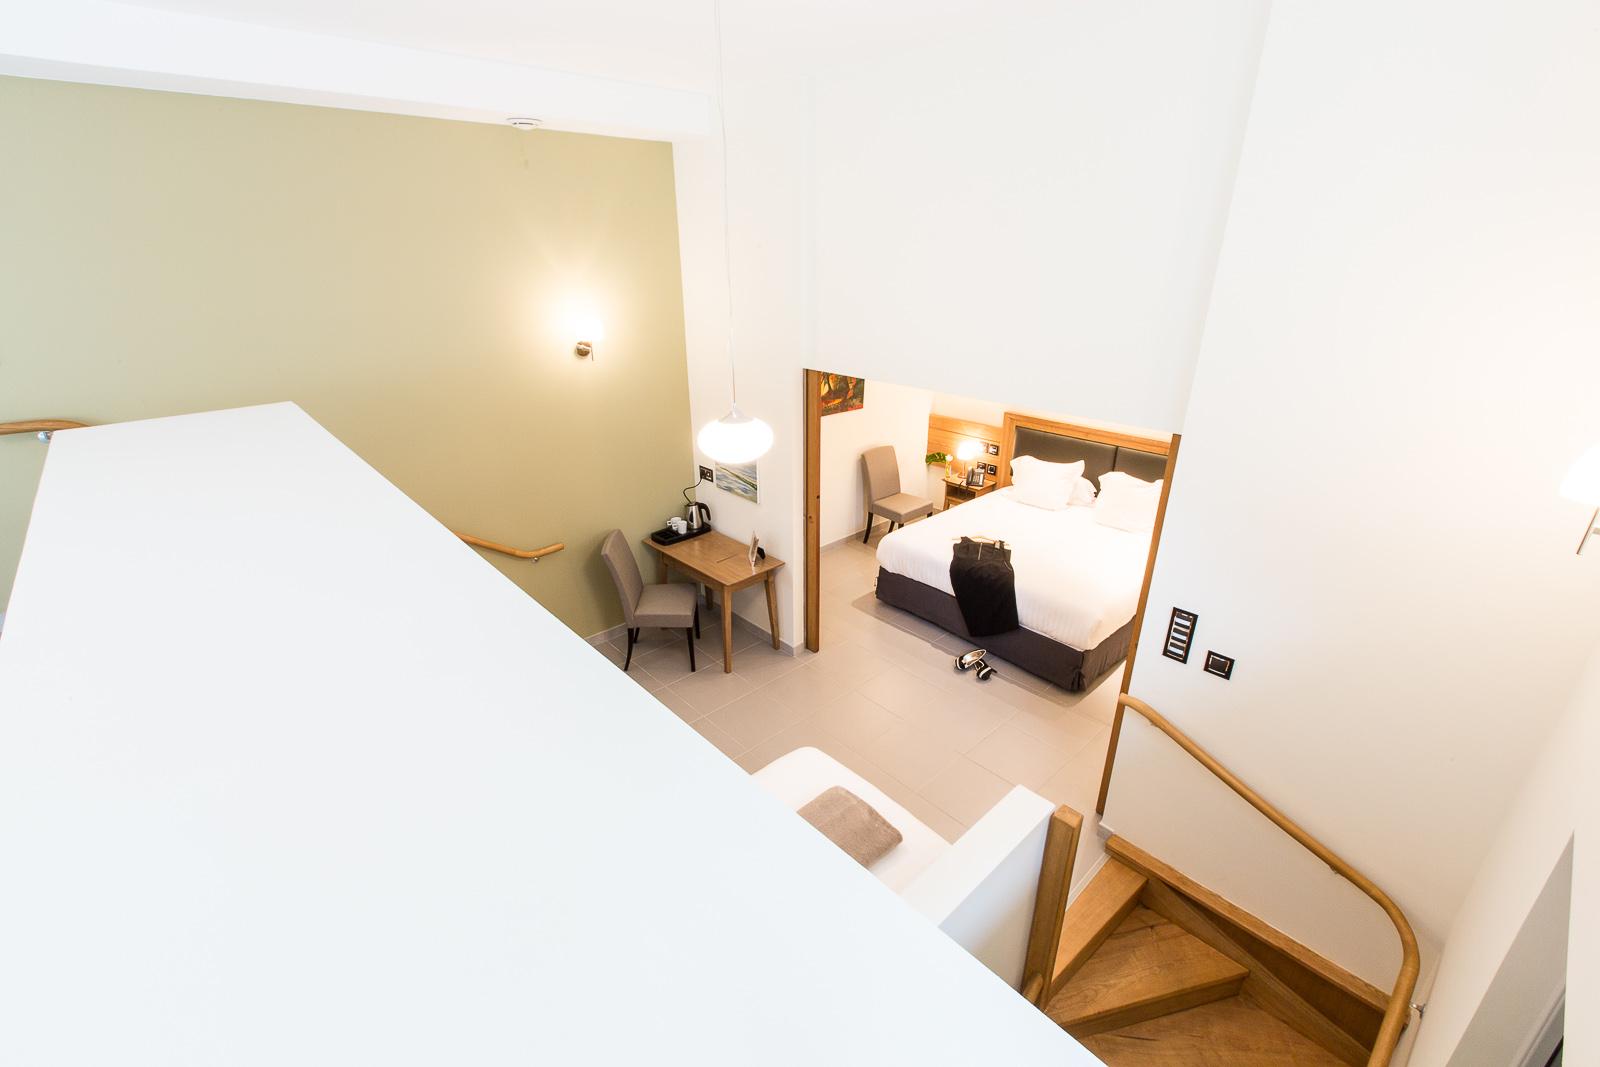 Hotel marotte suite balneo etage